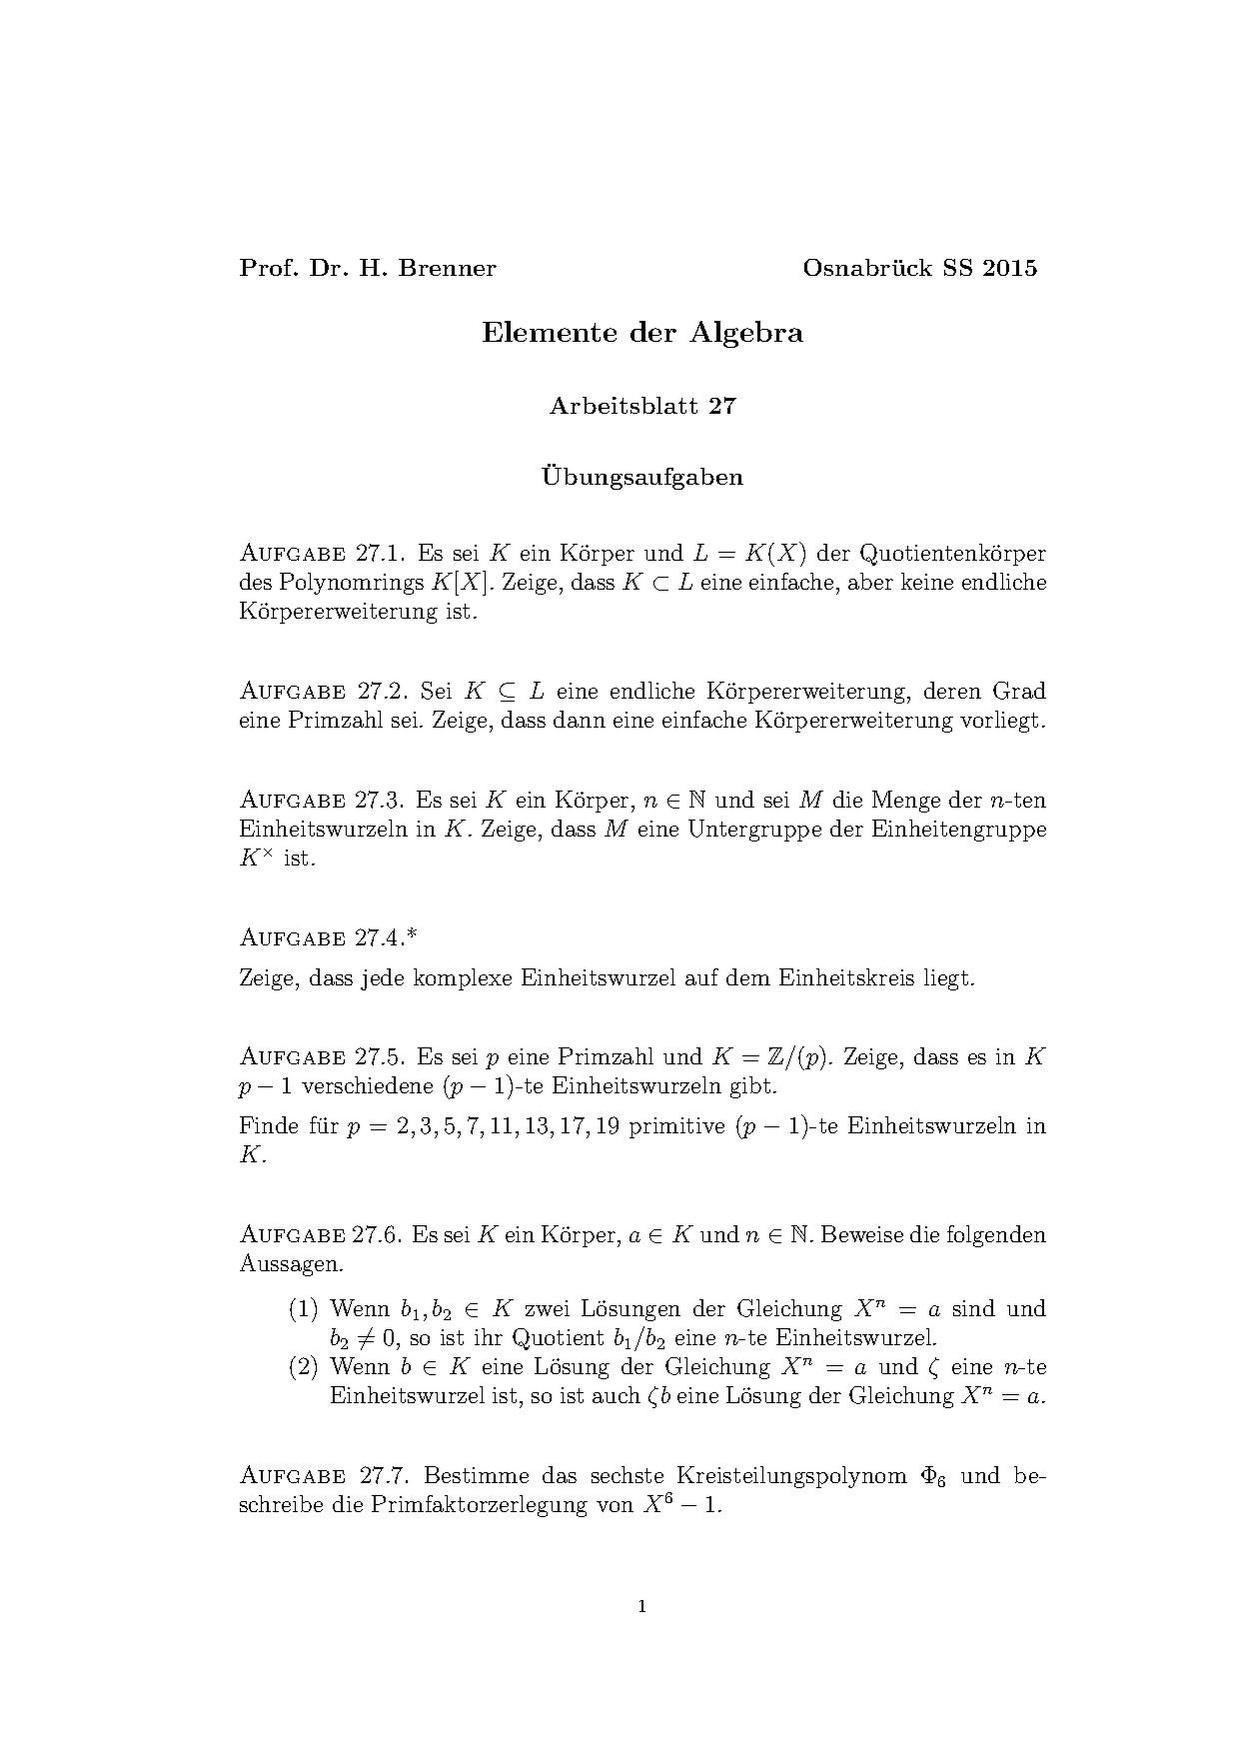 File:Elemente der Algebra (Osnabrück 2015)Arbeitsblatt27.pdf ...